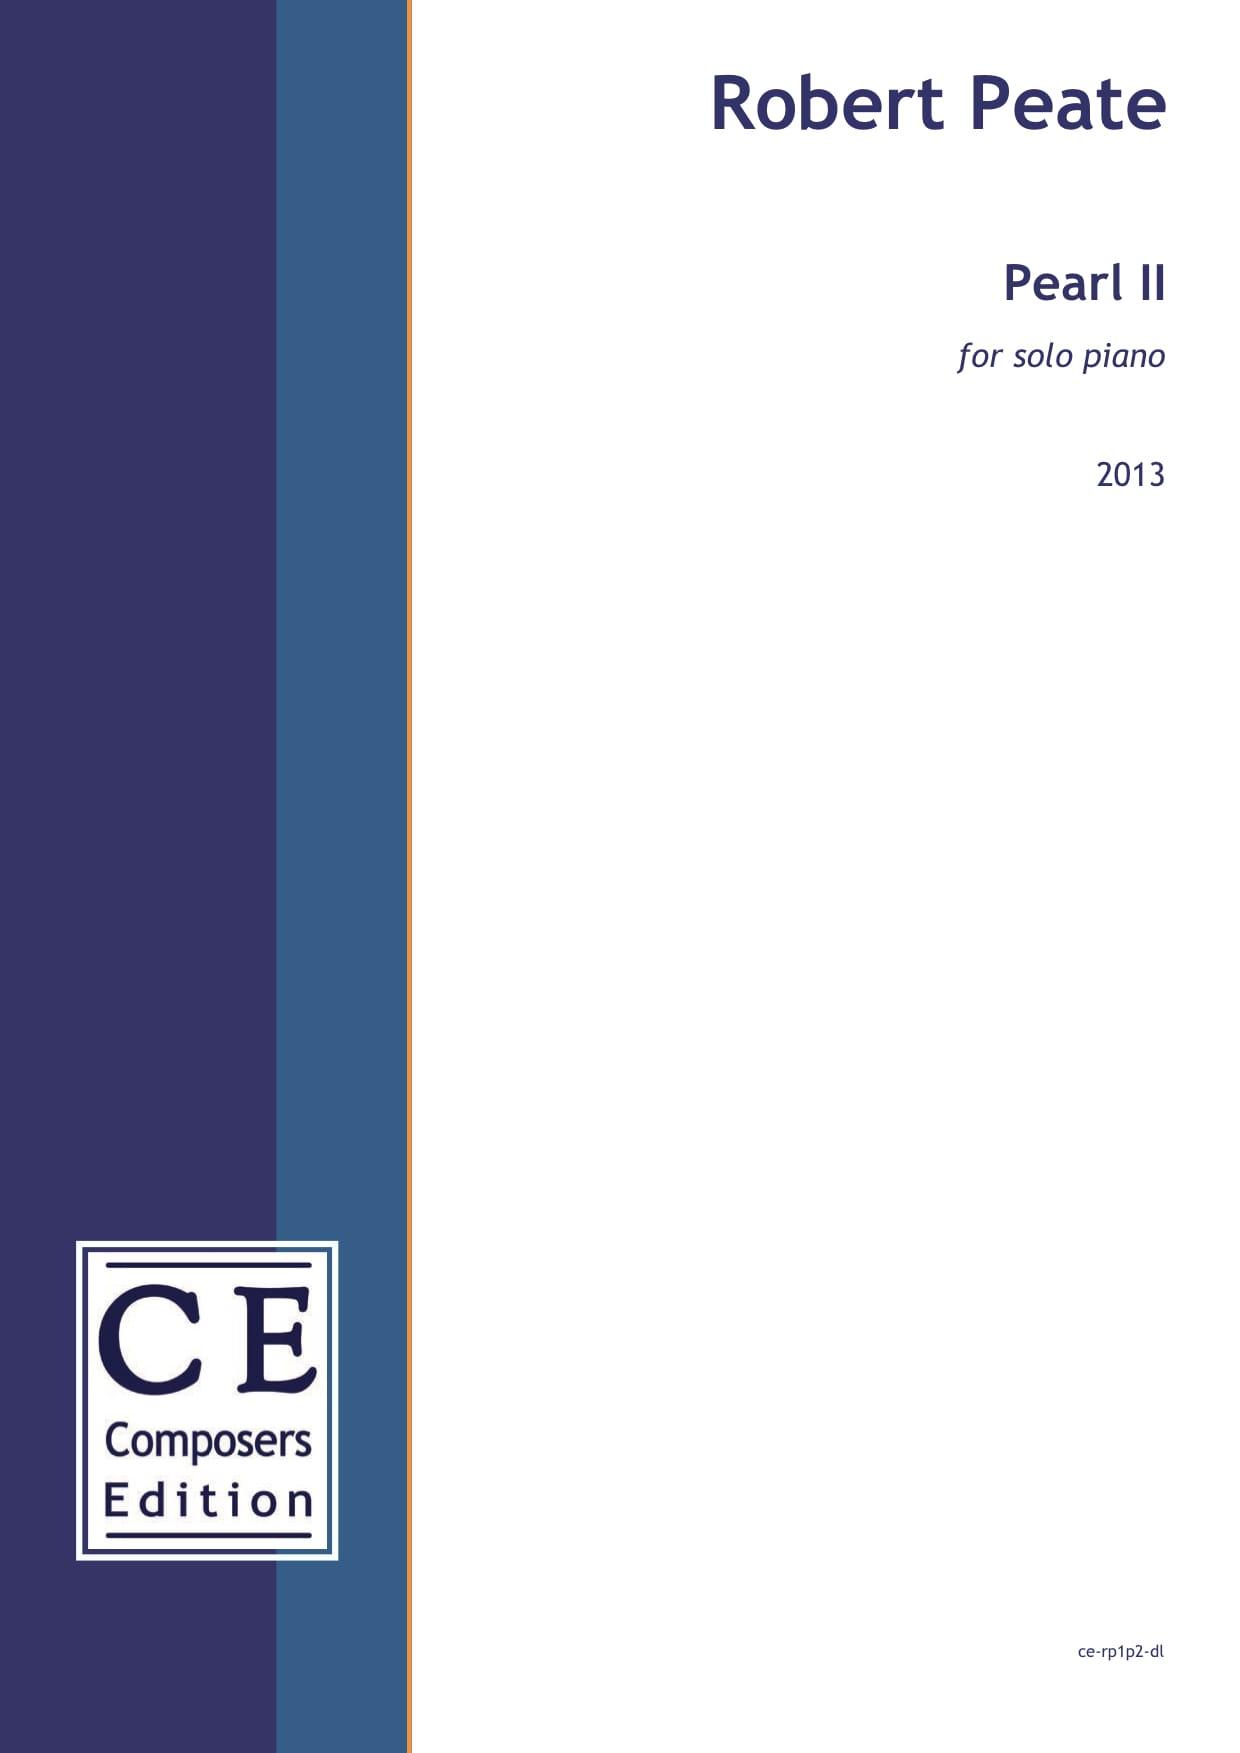 Robert Peate: Pearl II for solo piano